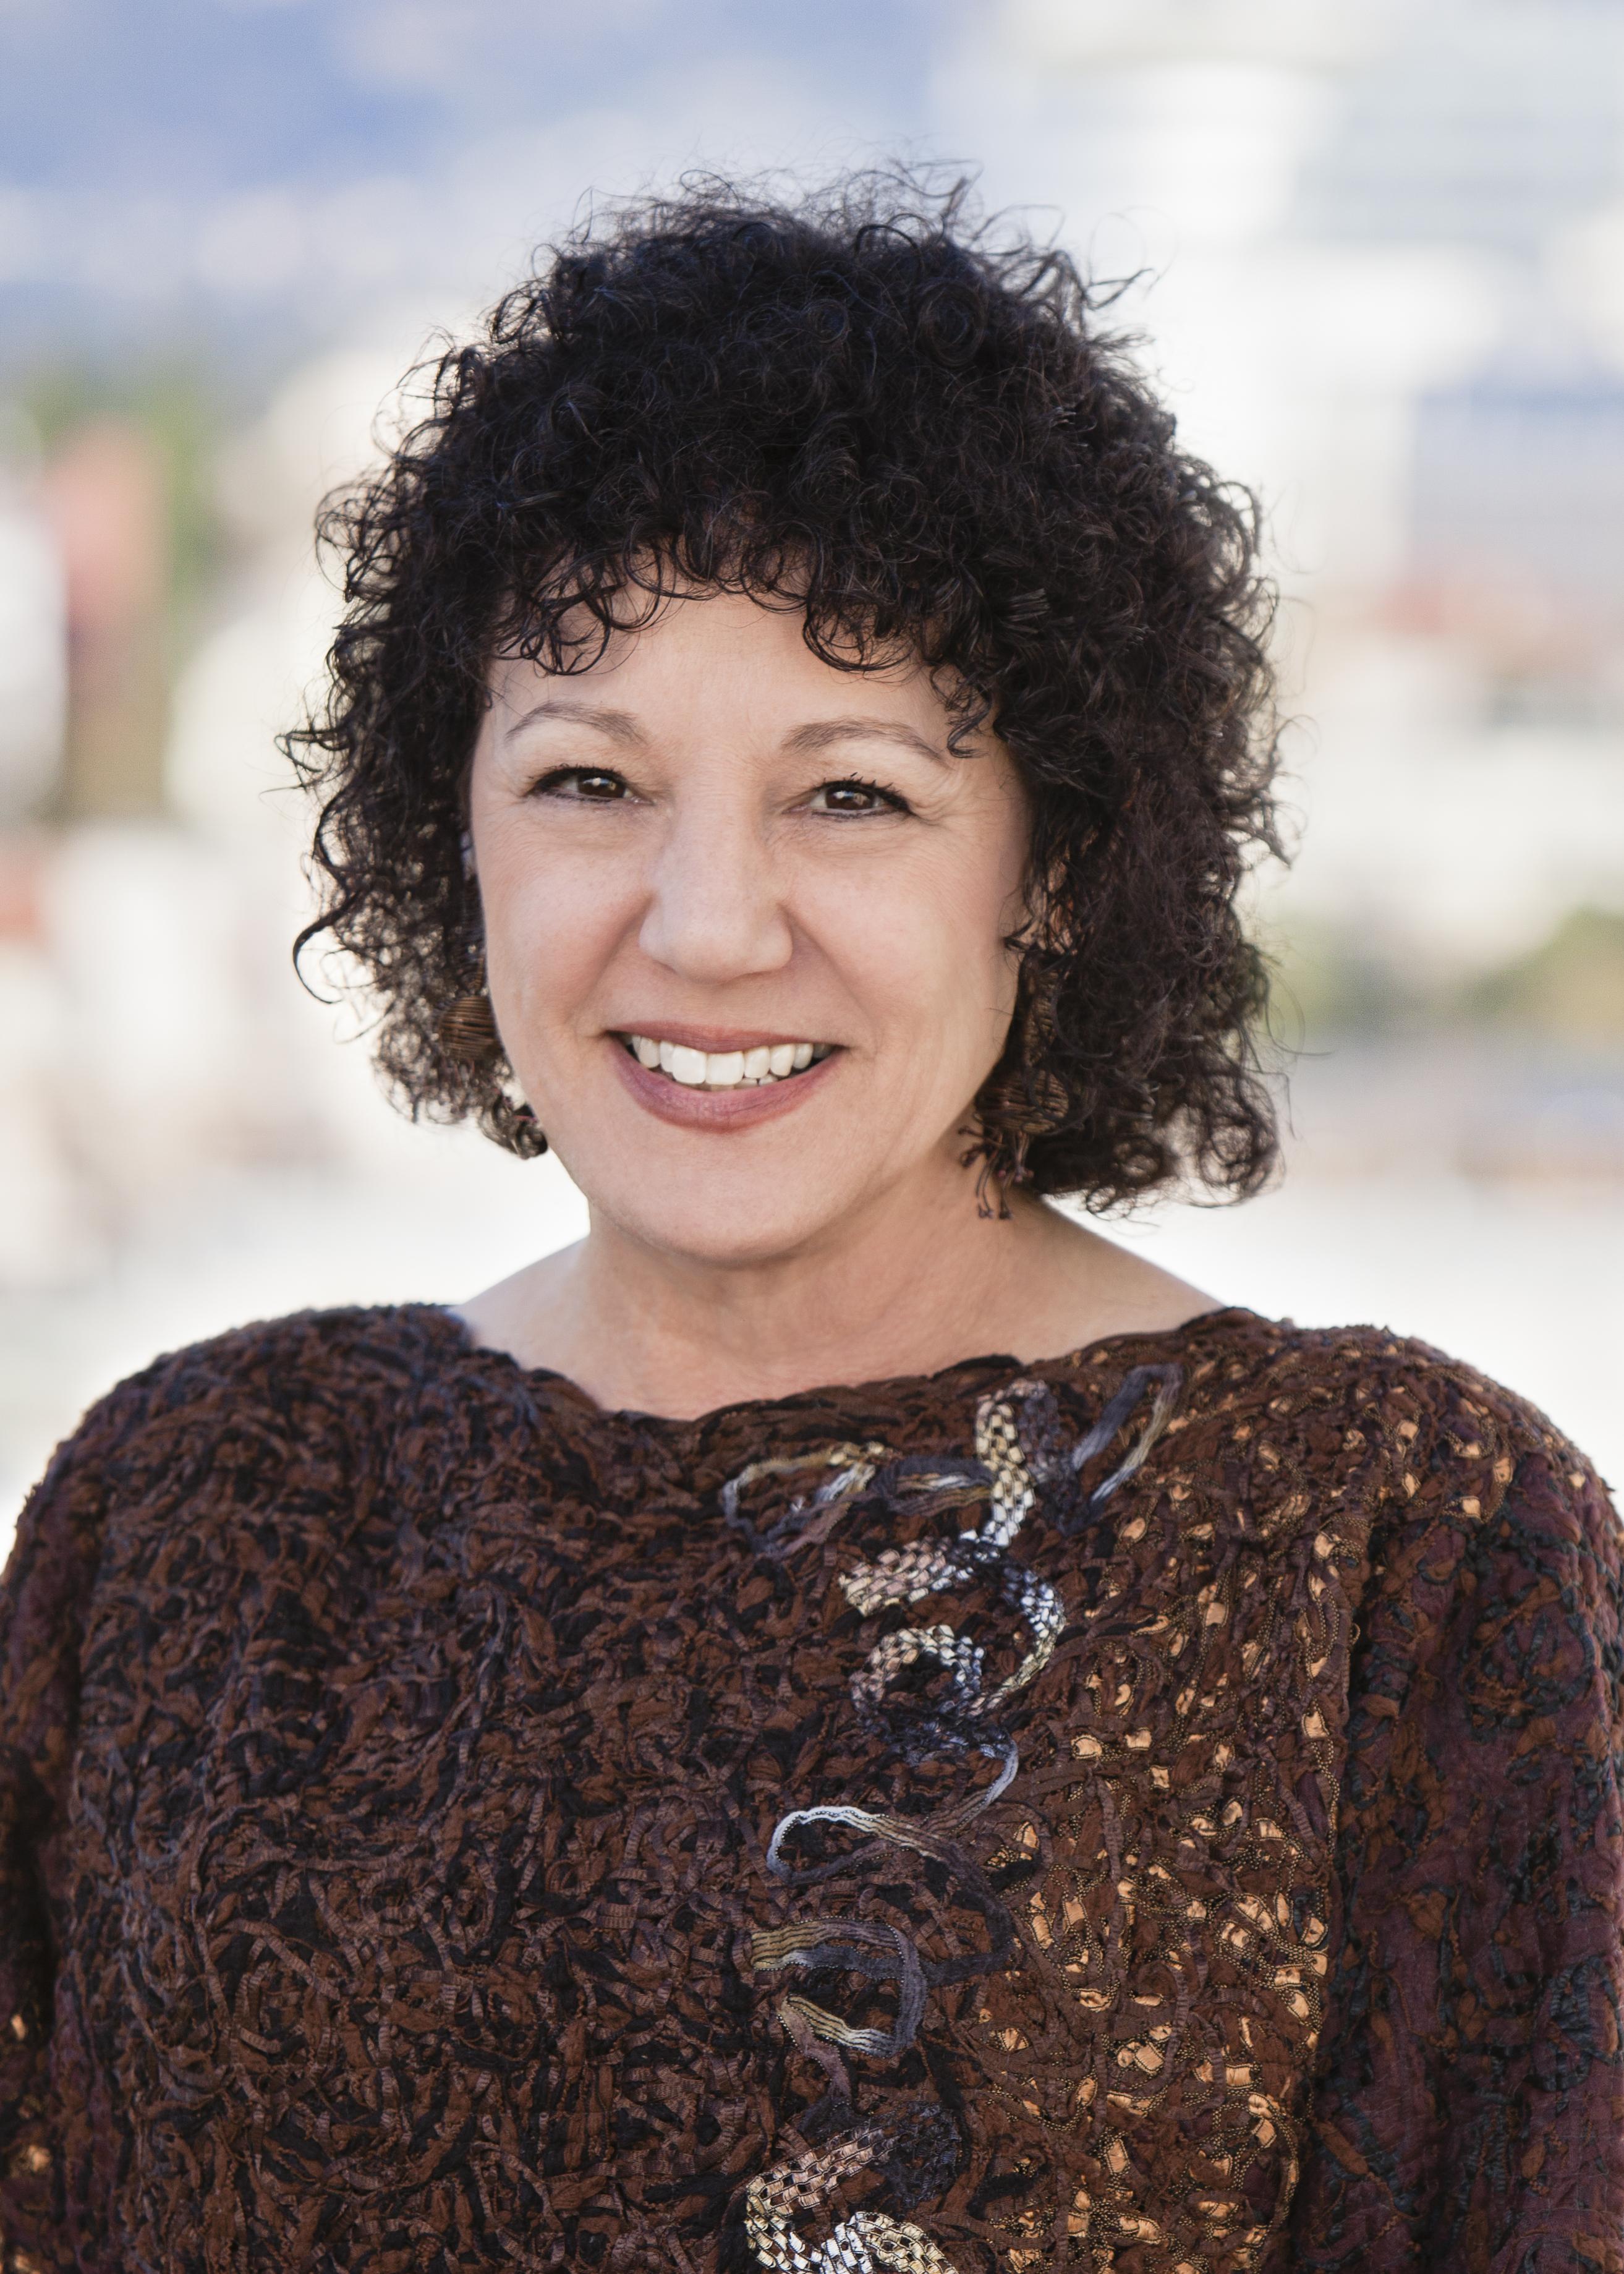 Venture capitalist and activist Freada Kapor Klein